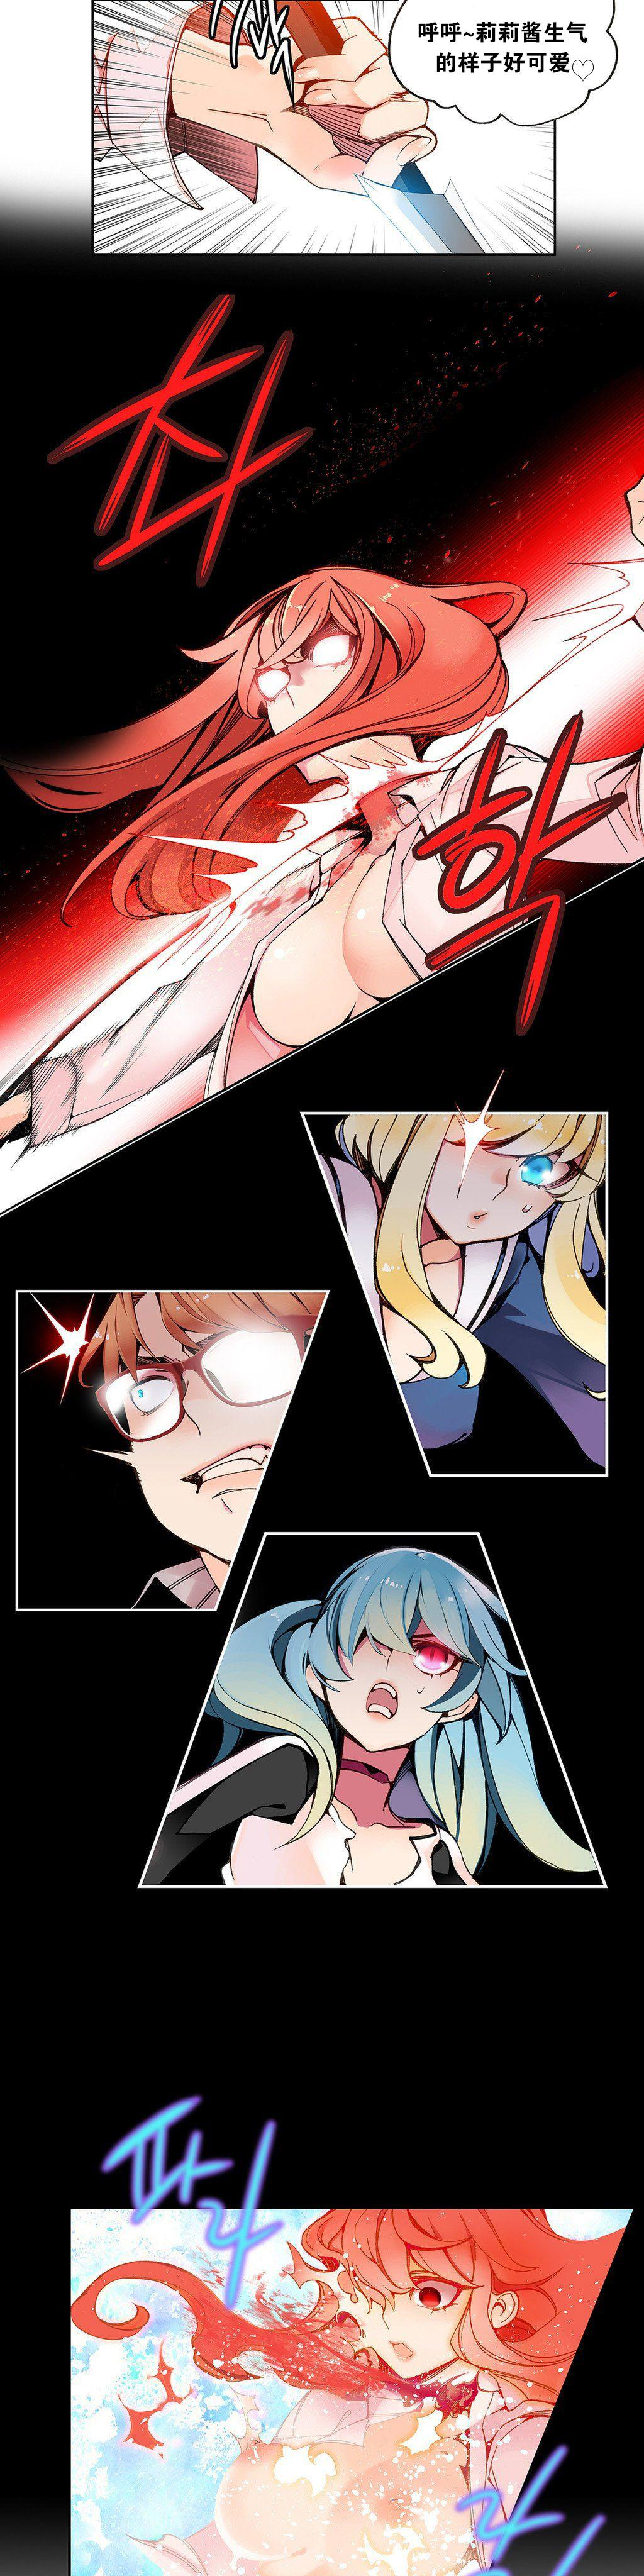 Lilith`s Cord Ch.1-10 82